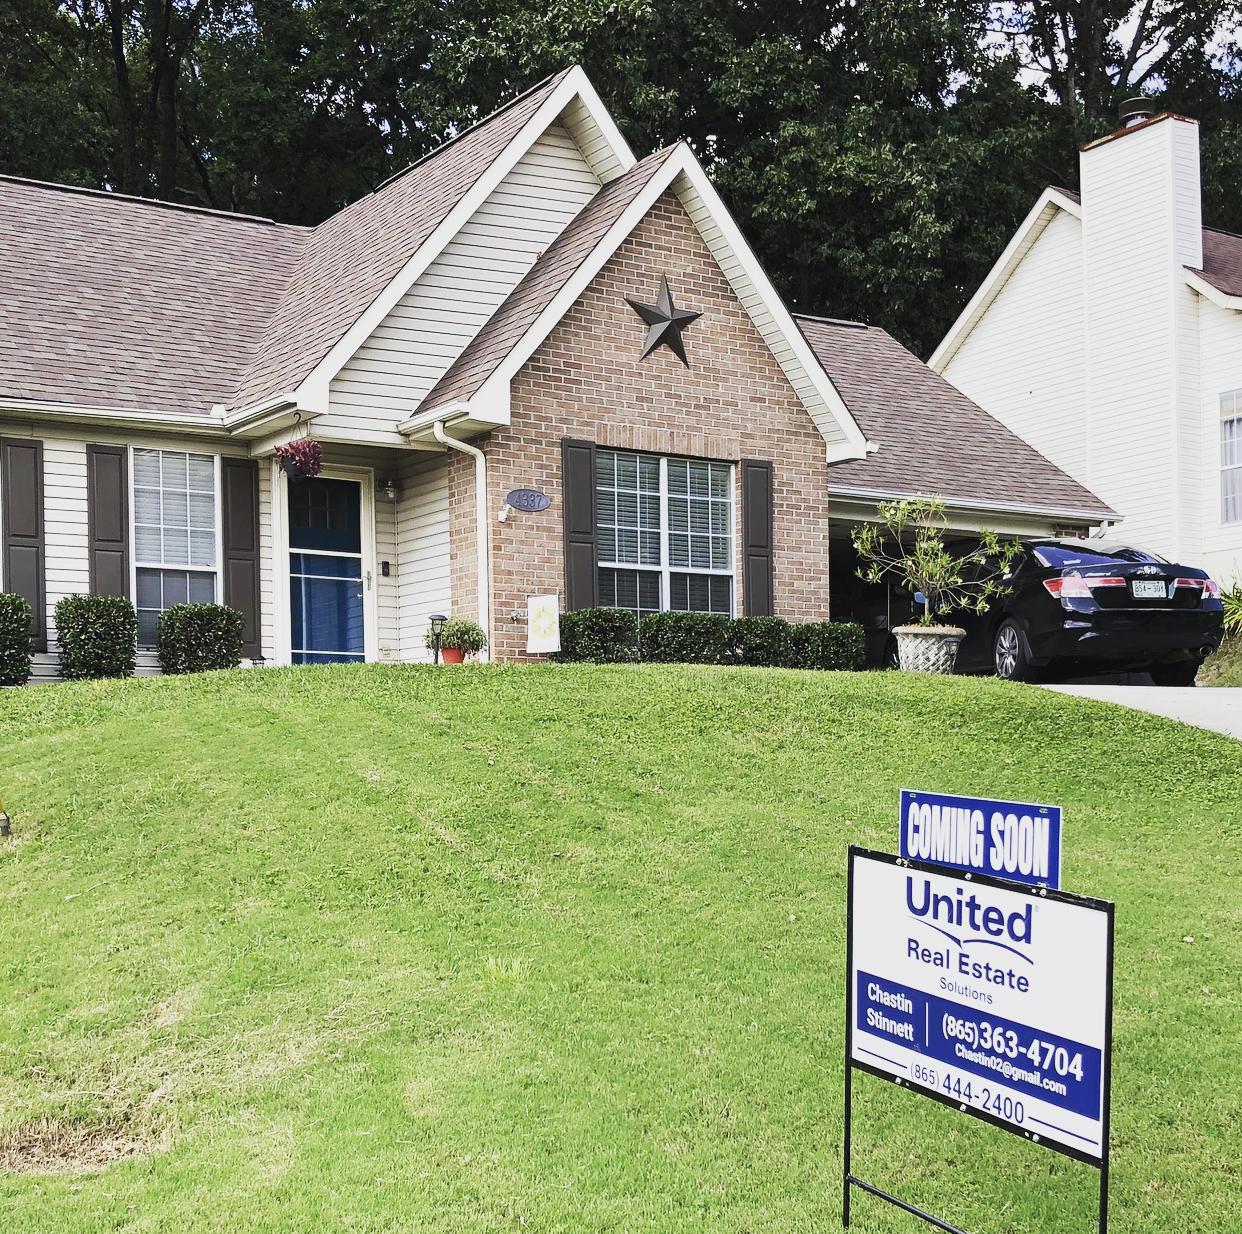 4337 Walnut Ridge, Knoxville, Tennessee, United States 37921, 3 Bedrooms Bedrooms, ,2 BathroomsBathrooms,Single Family,For Sale,Walnut Ridge,1130133